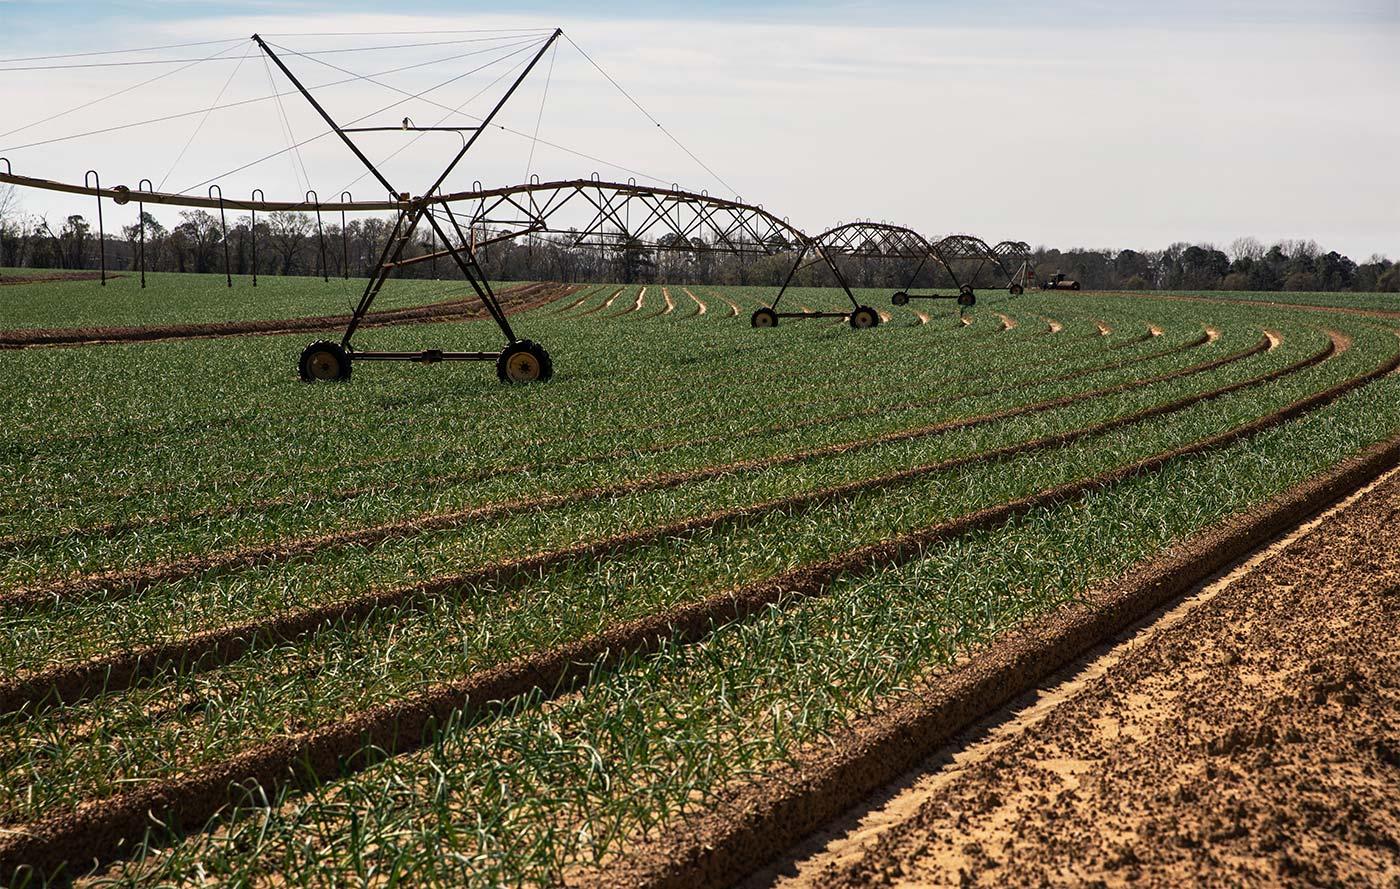 Field of Vidalia Onions in Georgia